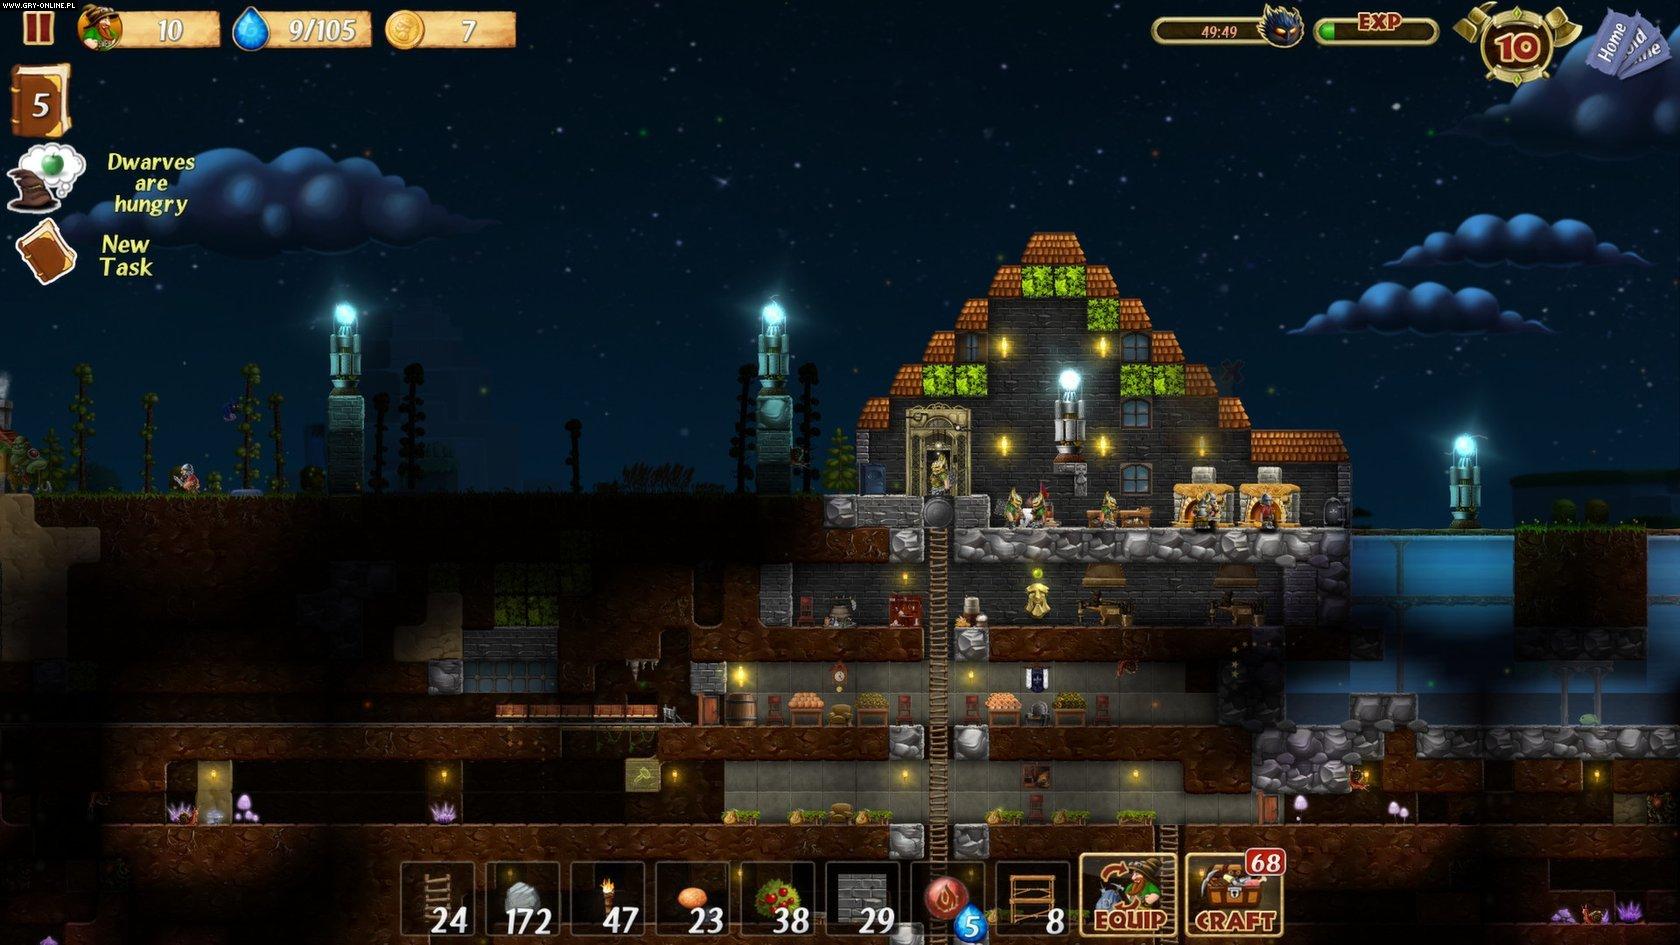 Craft Game For Pc : Craft the world galeria screenshotów screenshot